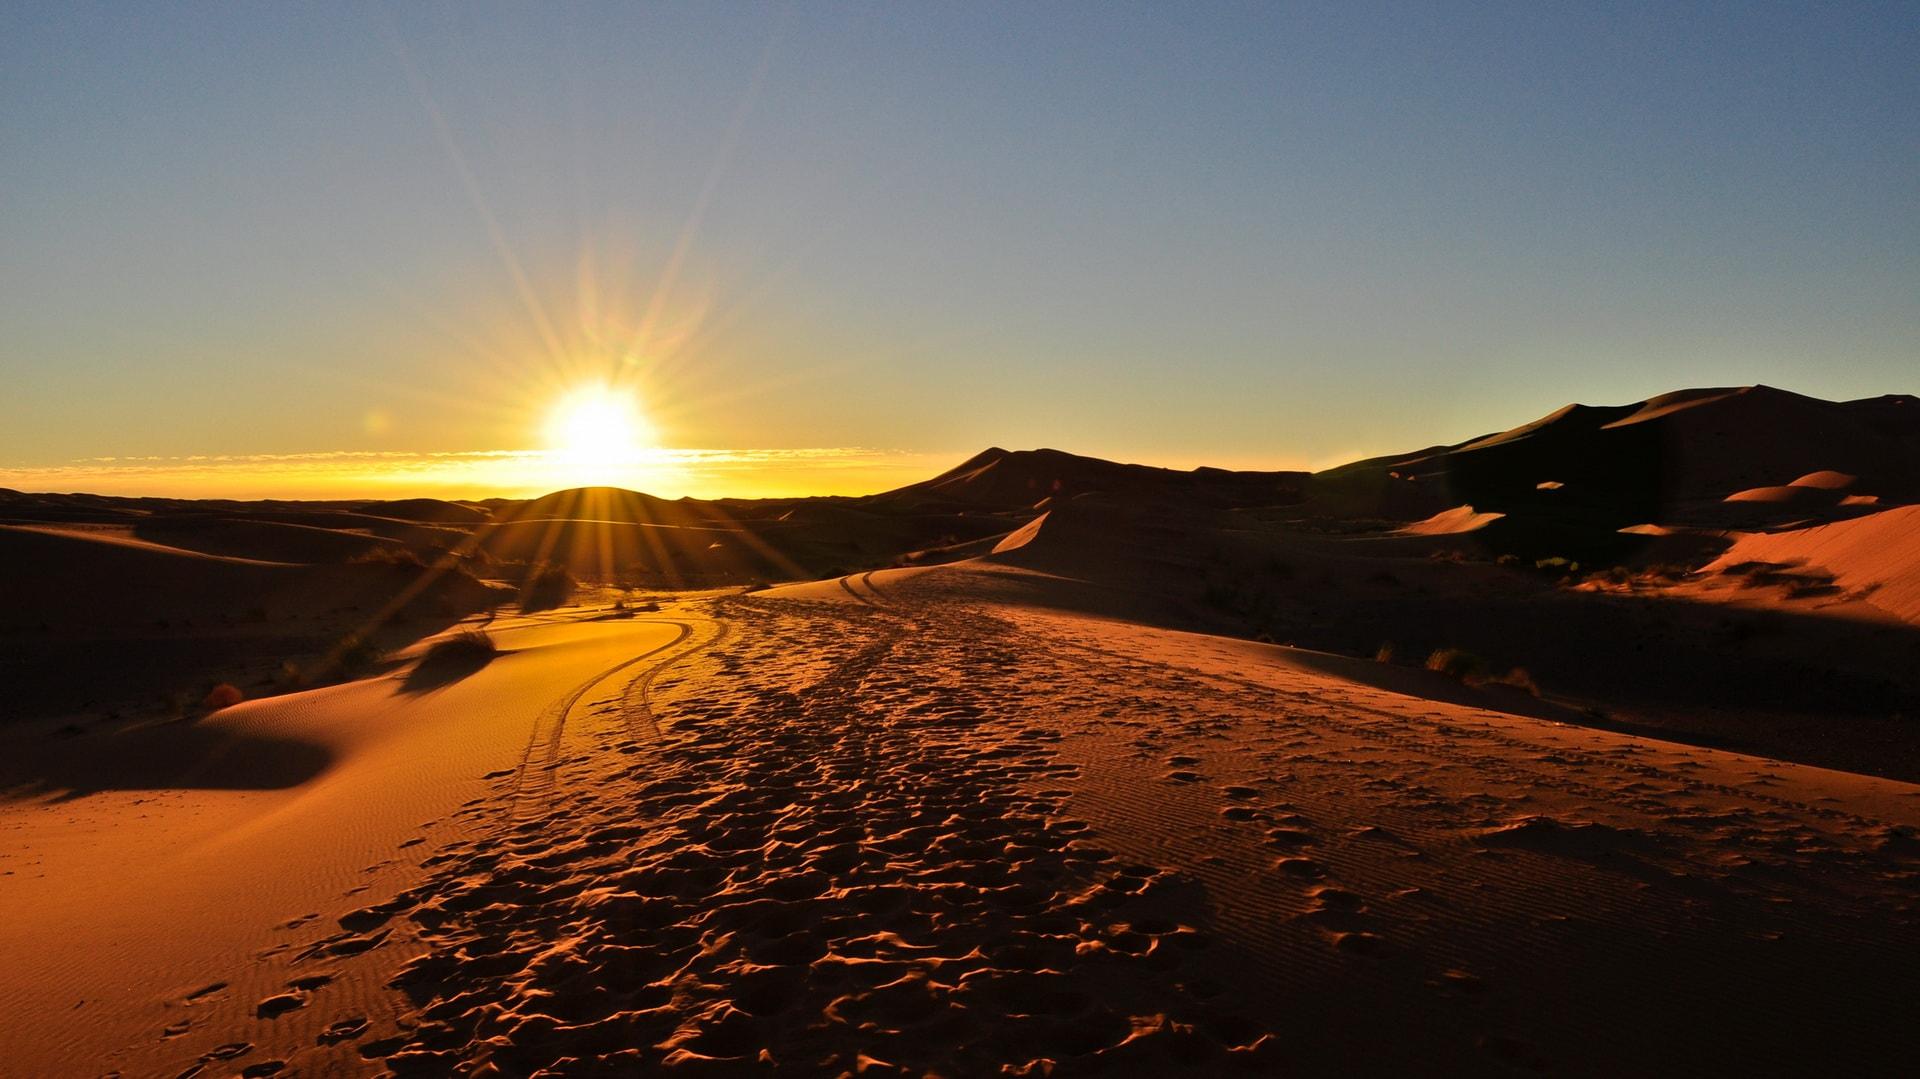 pathfinders treks - desert tour from fez to marrakech